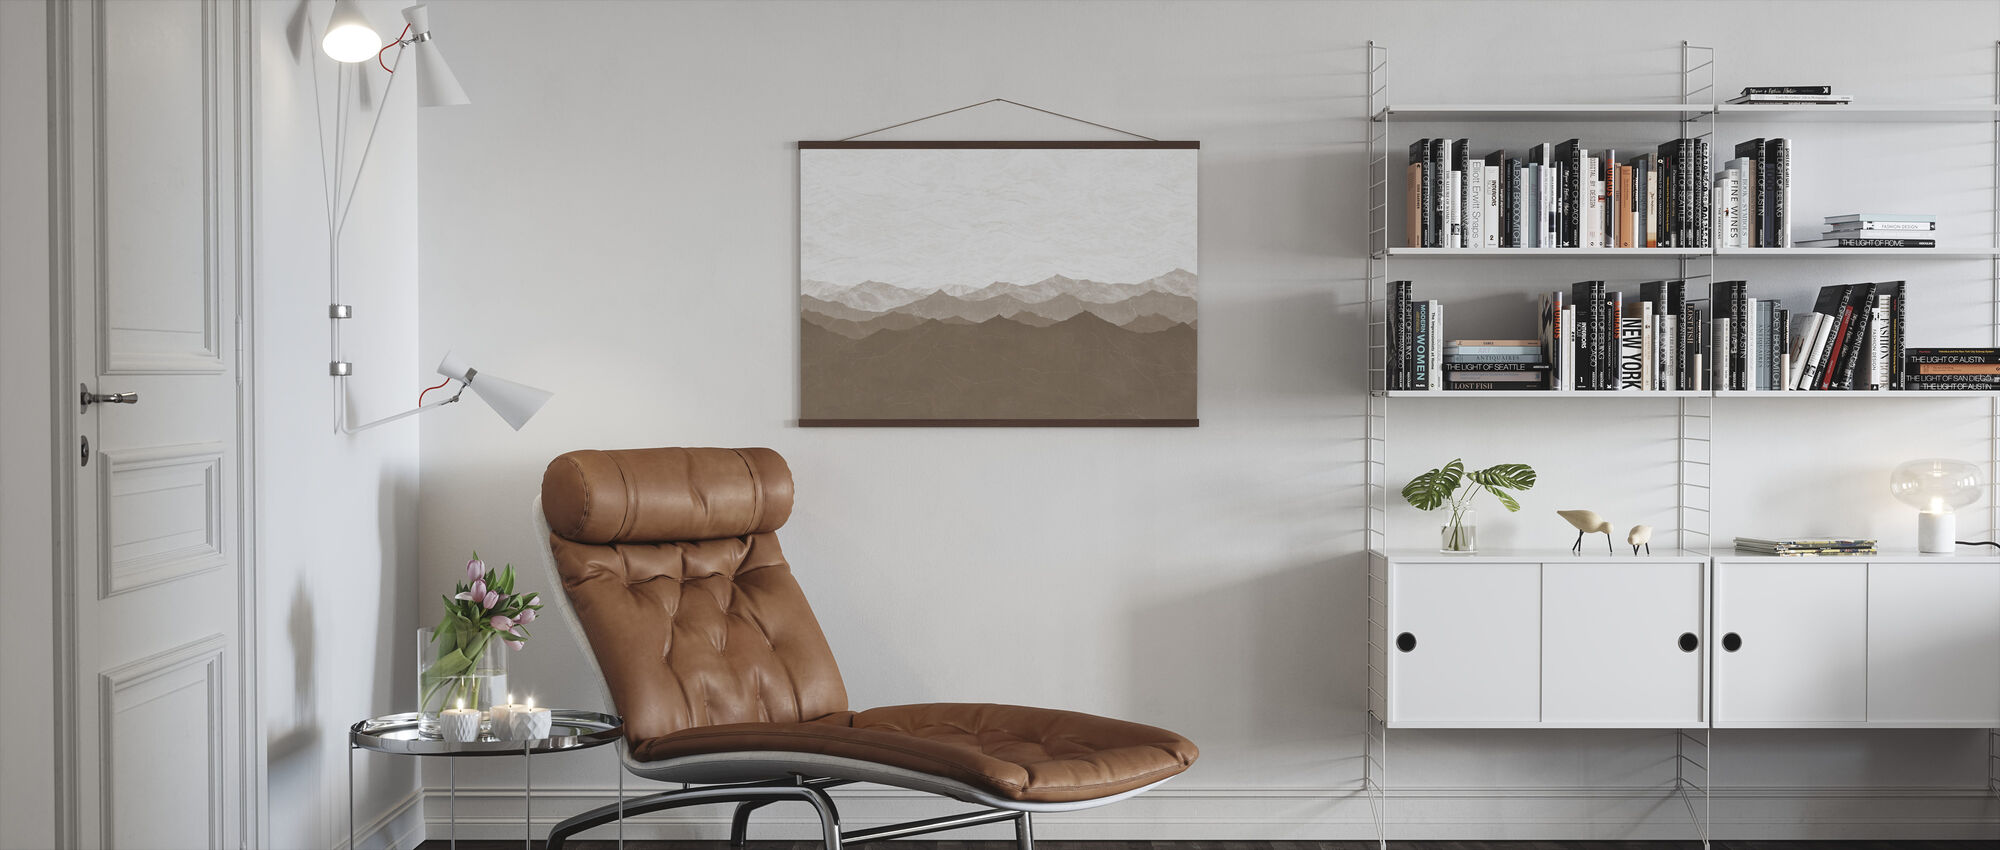 Montagne - Brown - Poster - Living Room